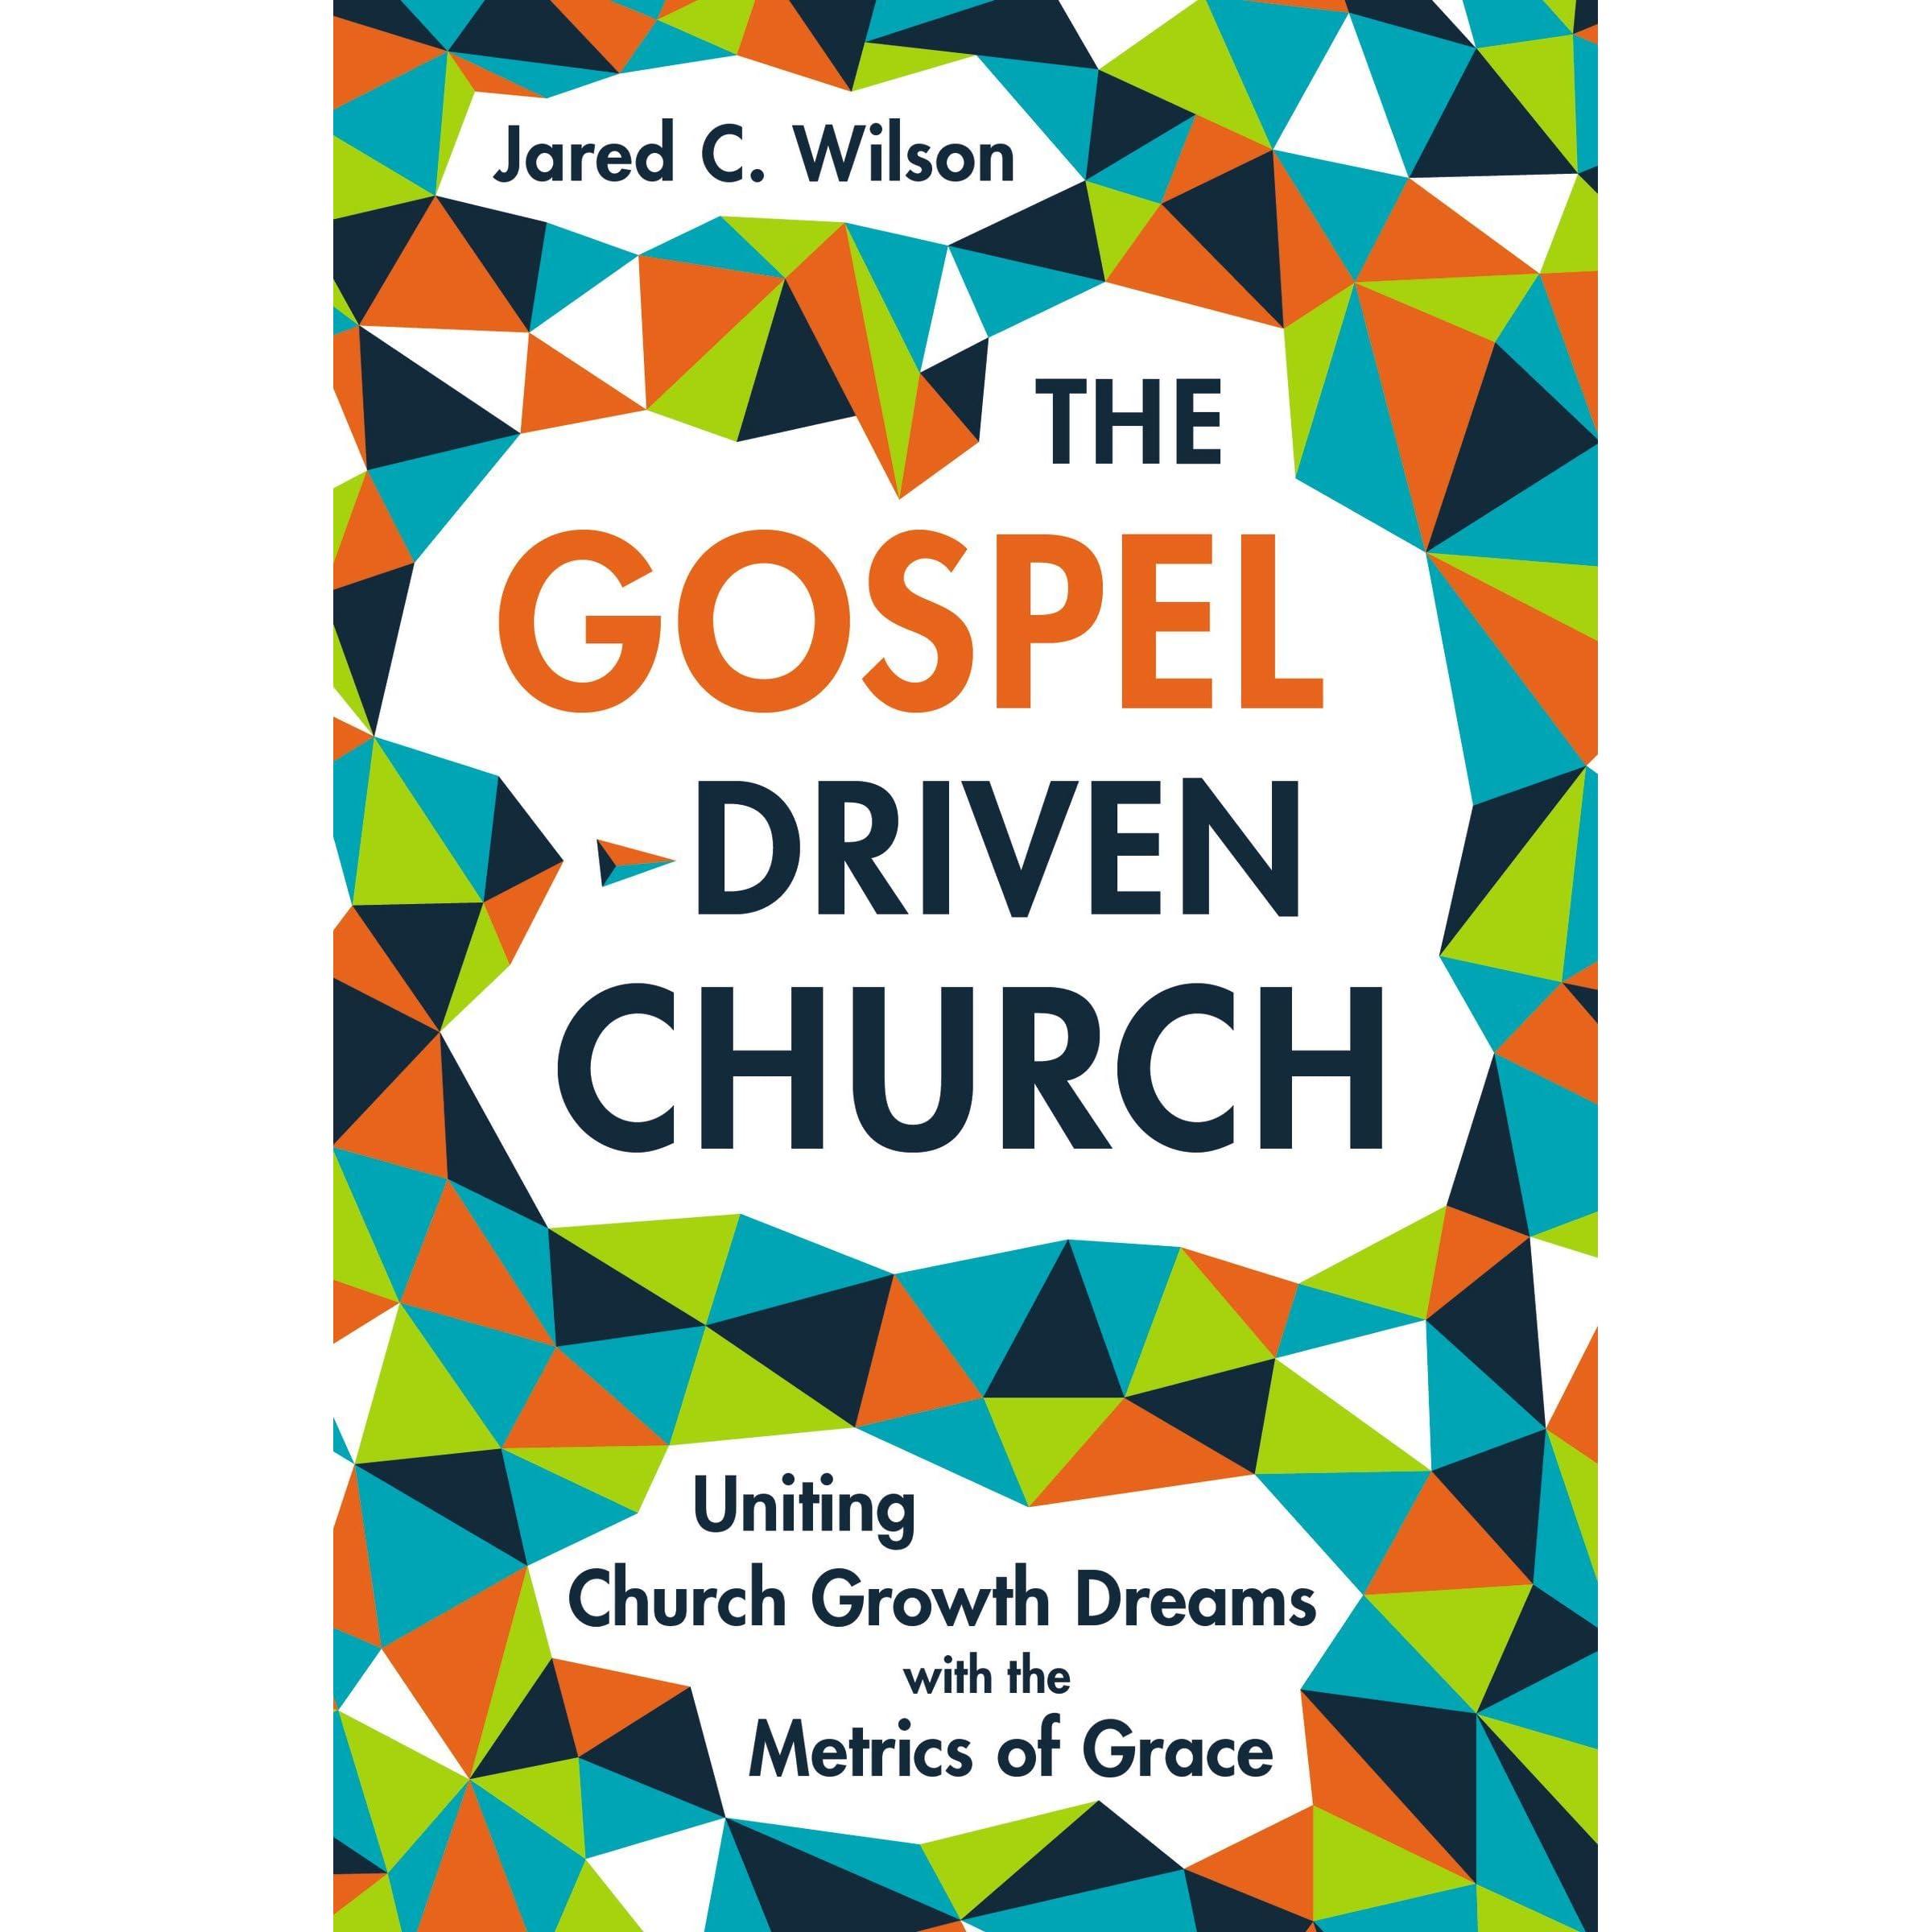 the gospel driven church uniting church growth dreams the